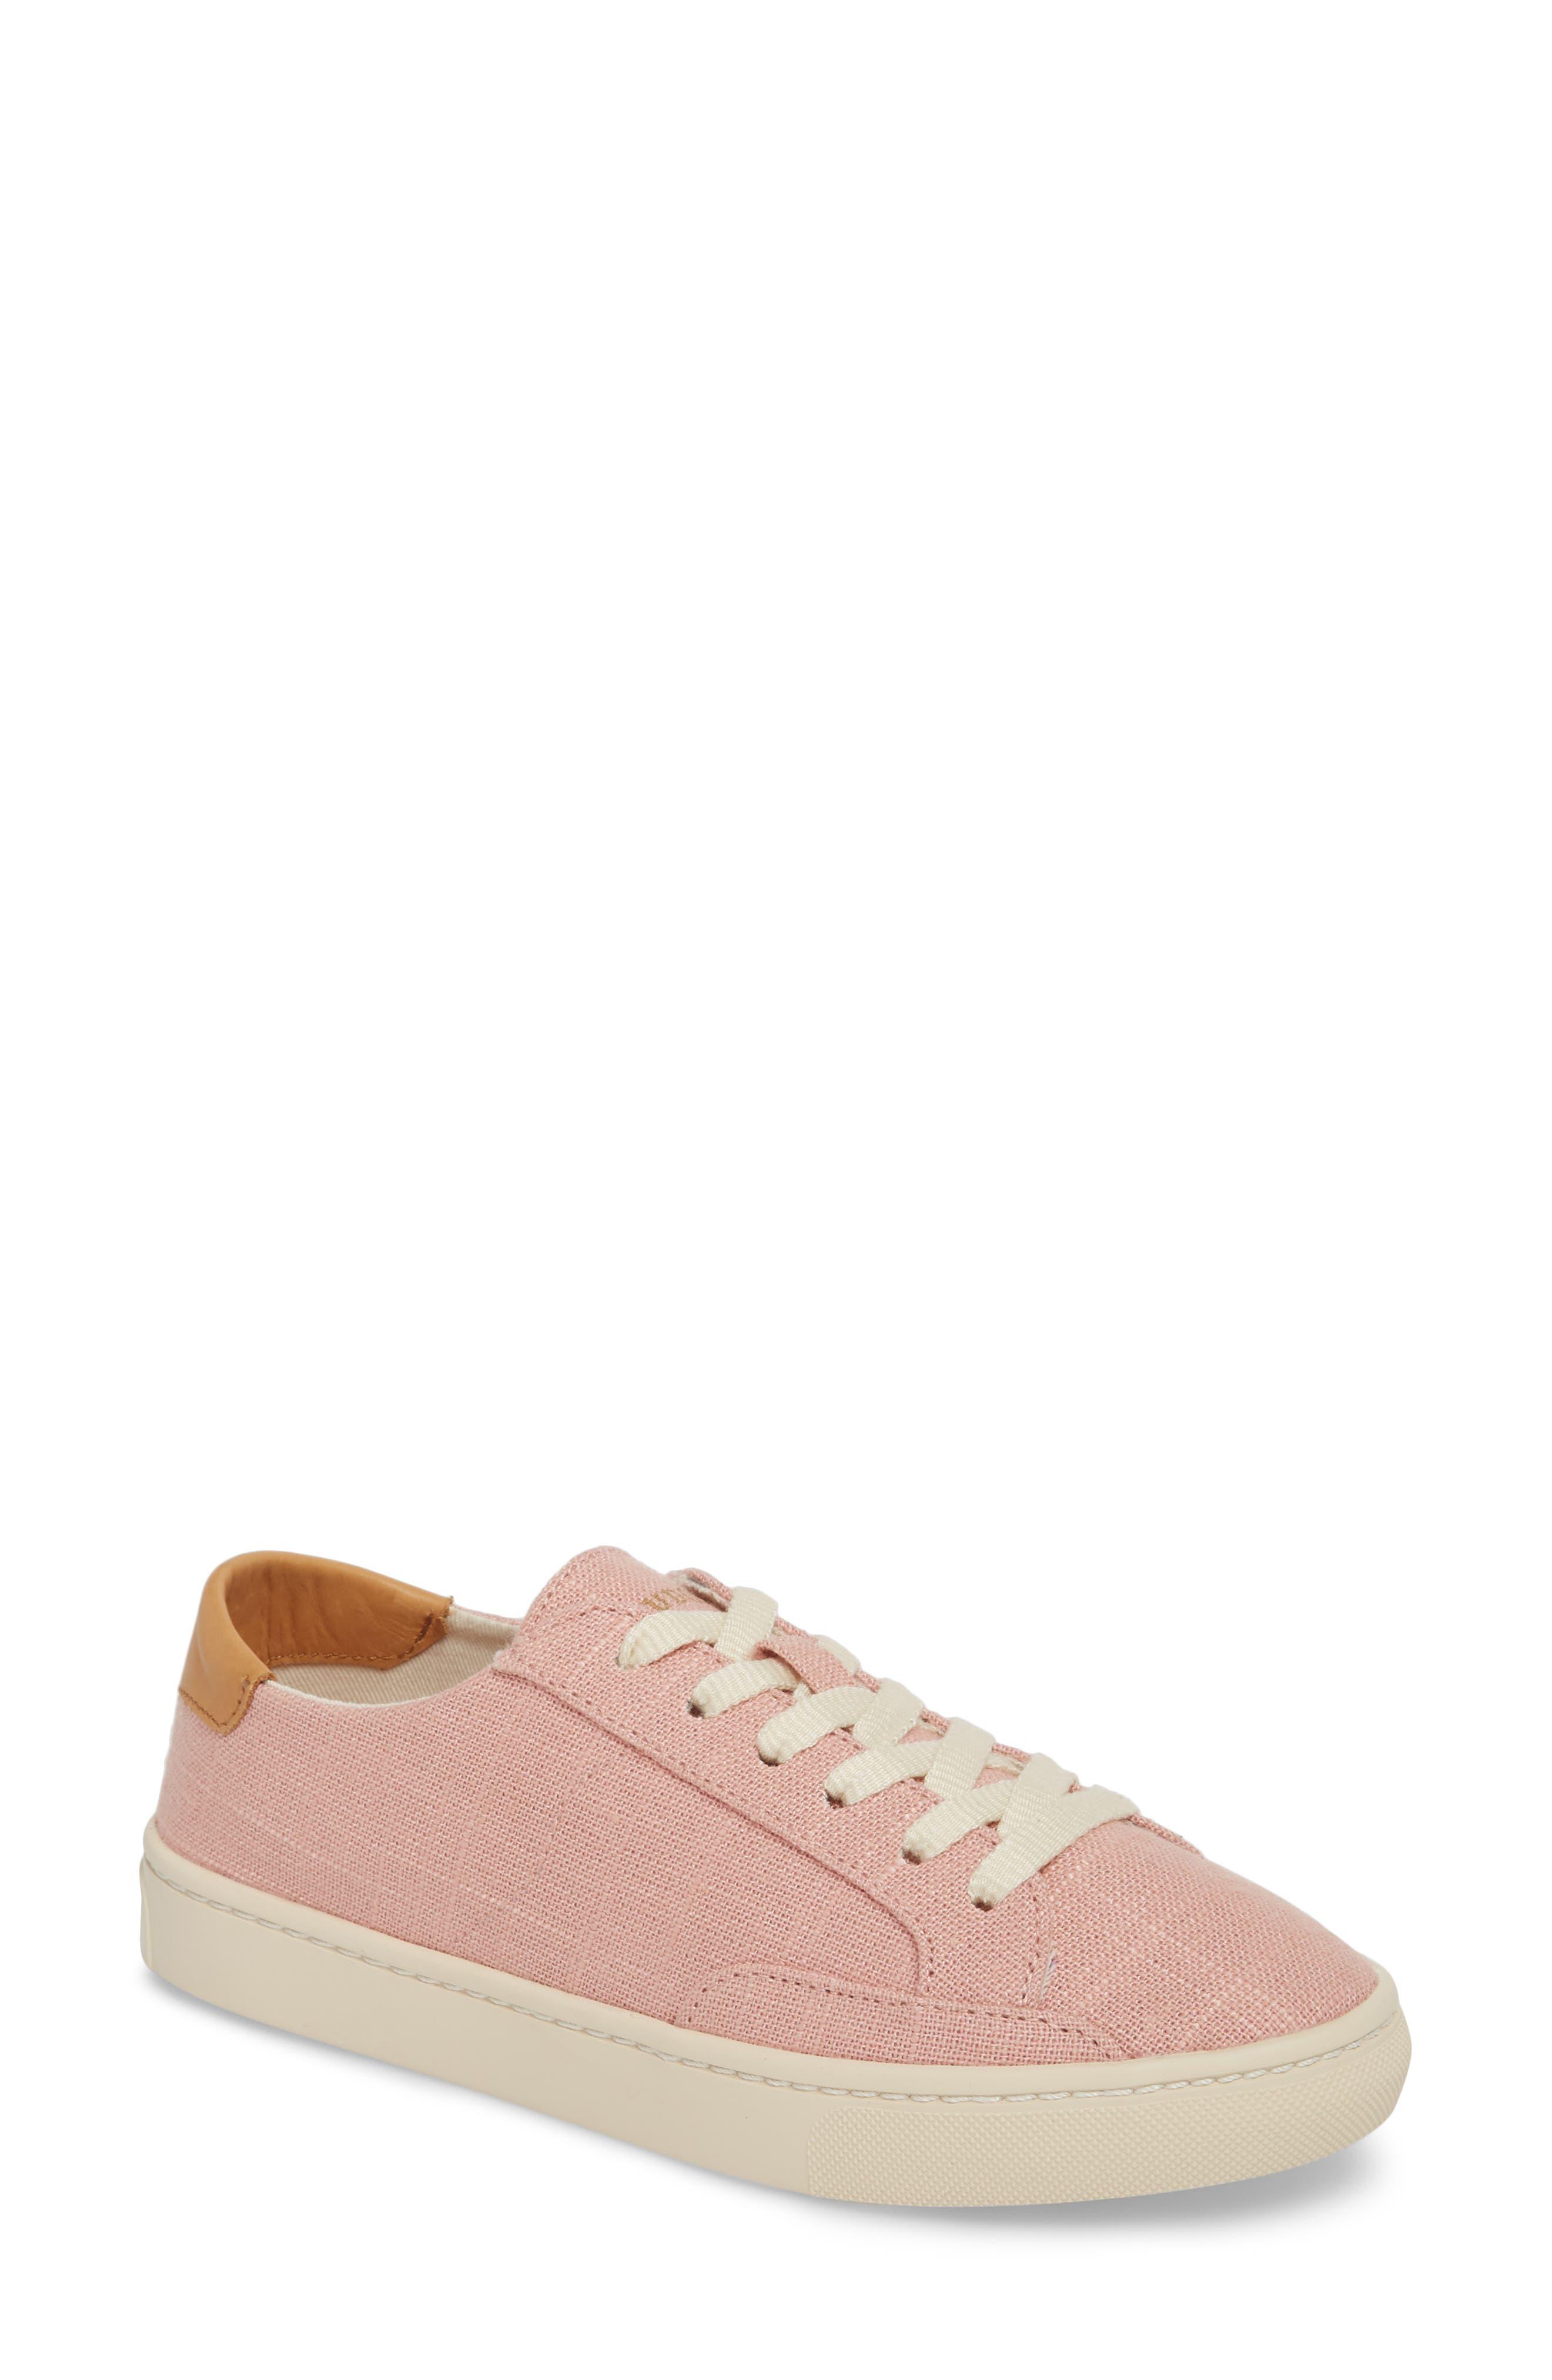 Ibiza Sneaker,                         Main,                         color, Dusty Rose Fabric